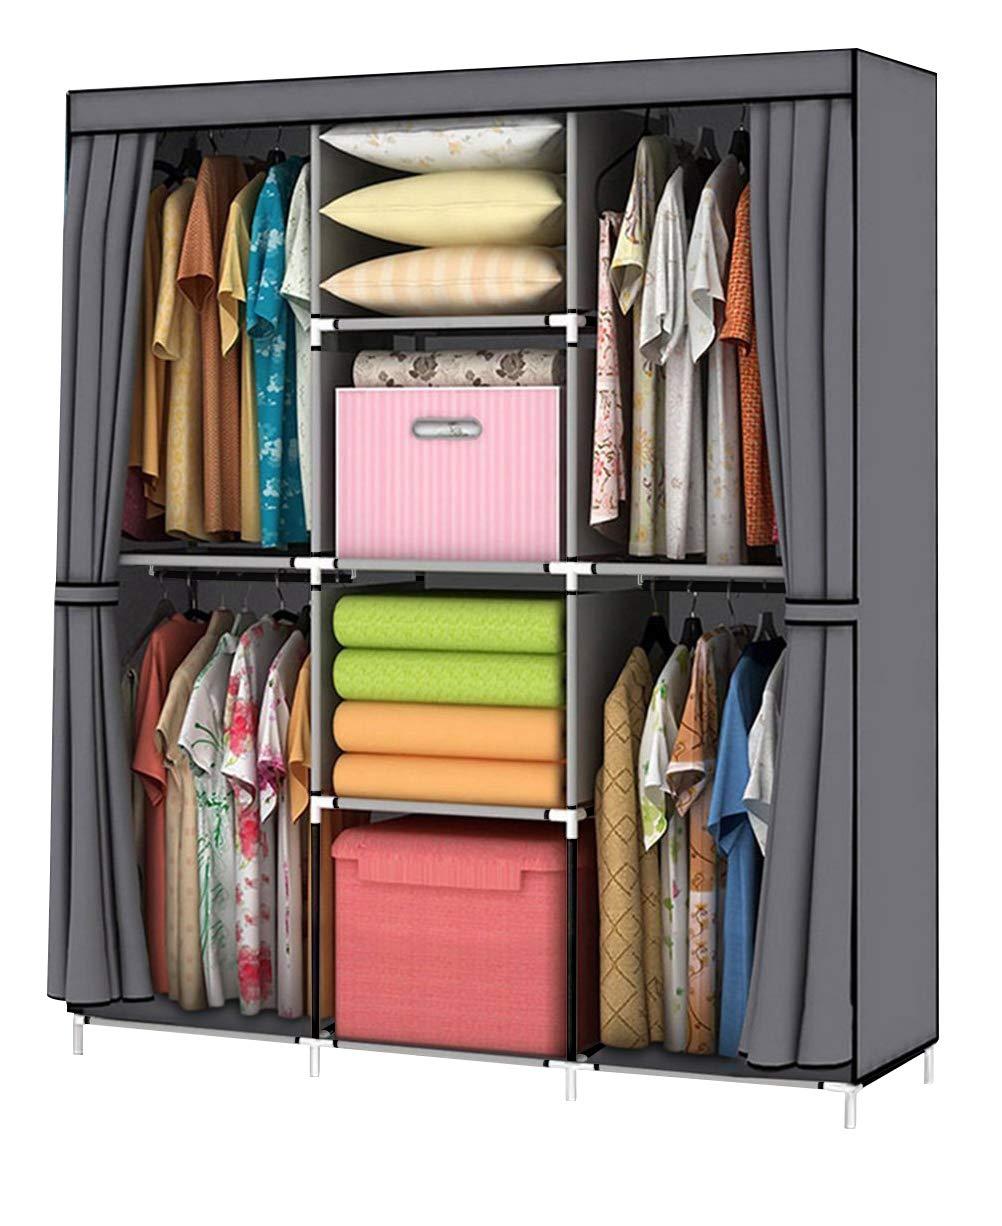 YOUUD Wardrobe Portable Organizer Standing